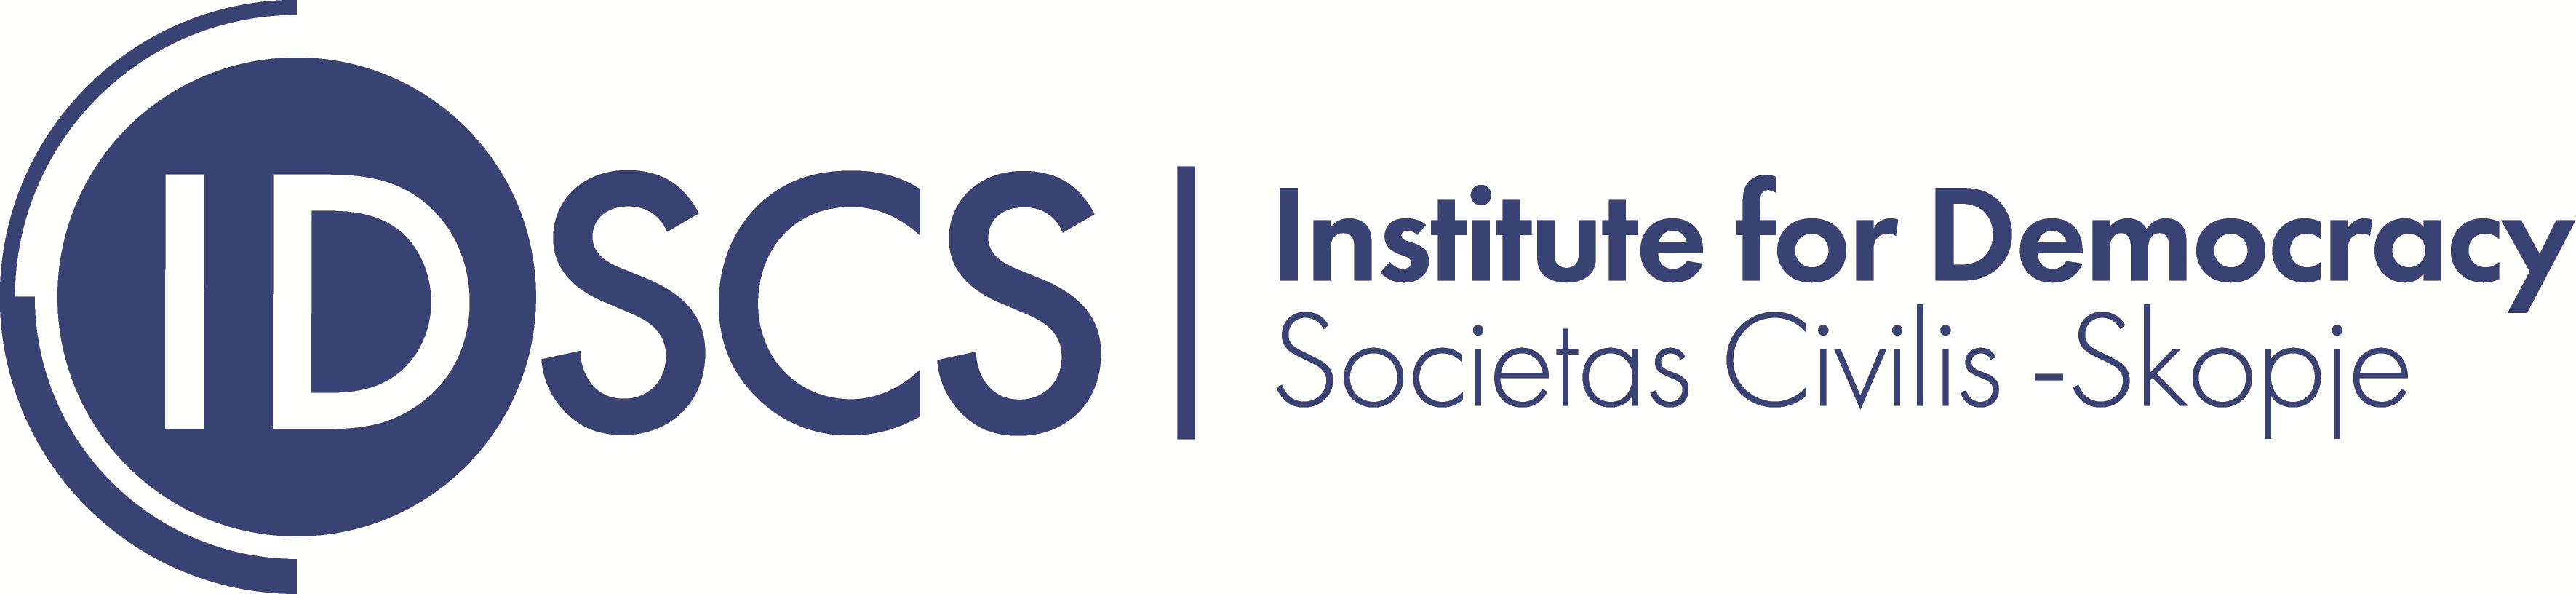 idscs logo